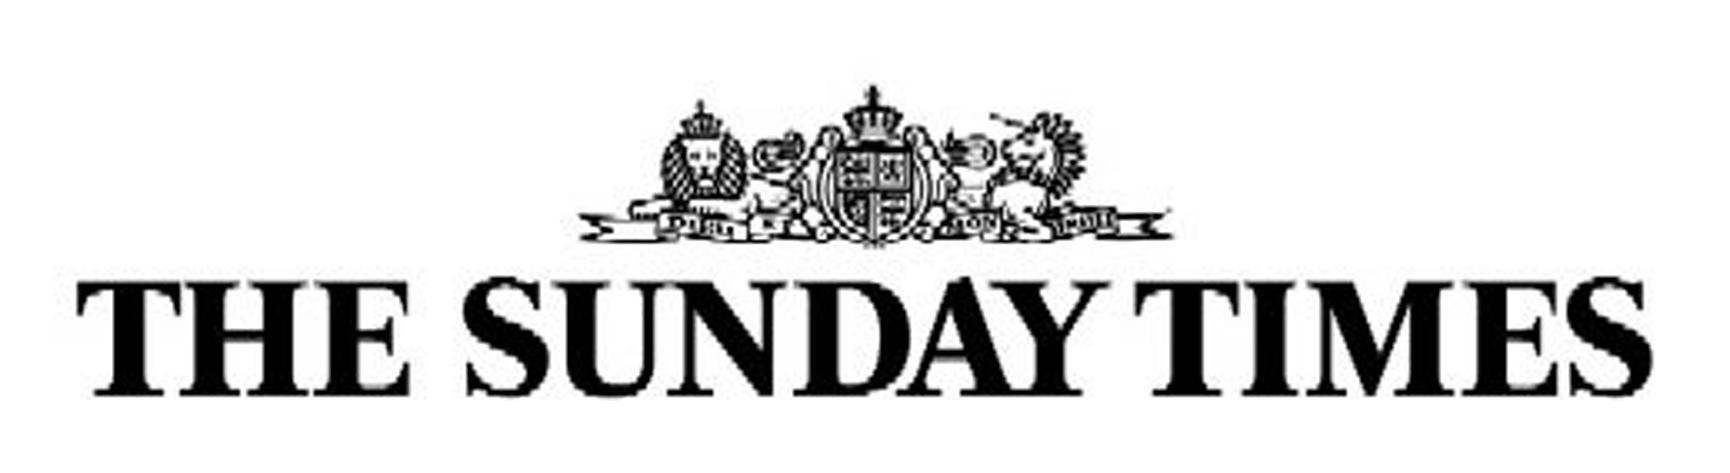 sunday-times-logo11.jpeg